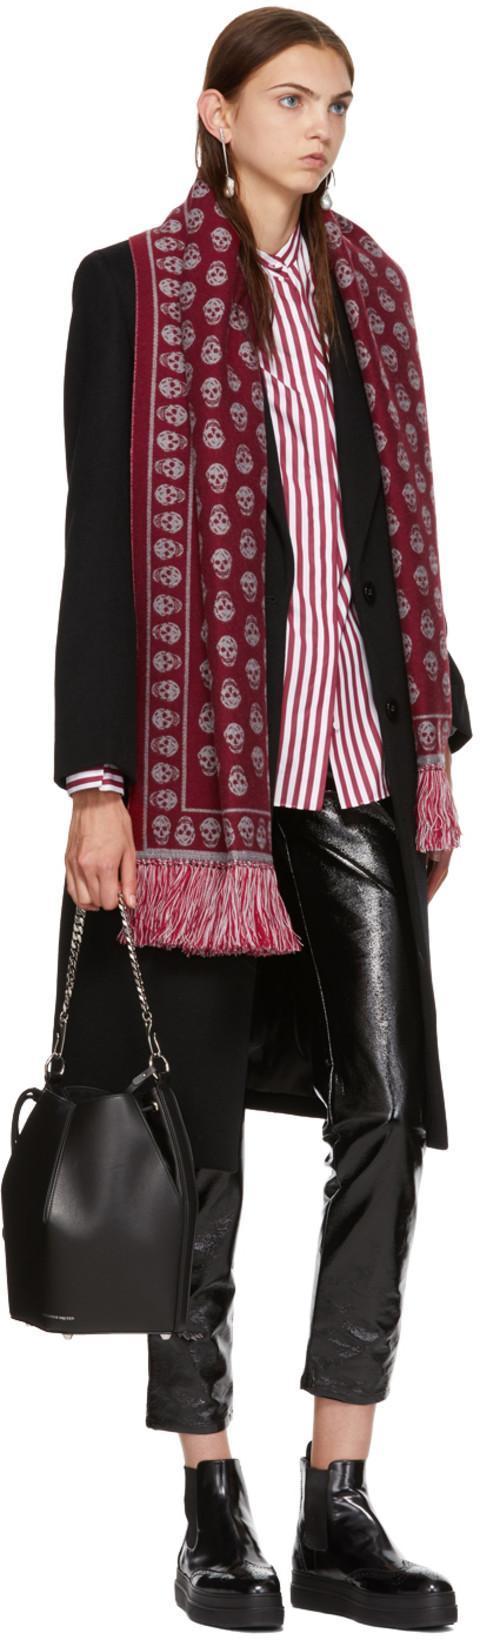 Chelsea Black Flatform Prada Modesens 45 Leather Boots qPtxXPOwaS